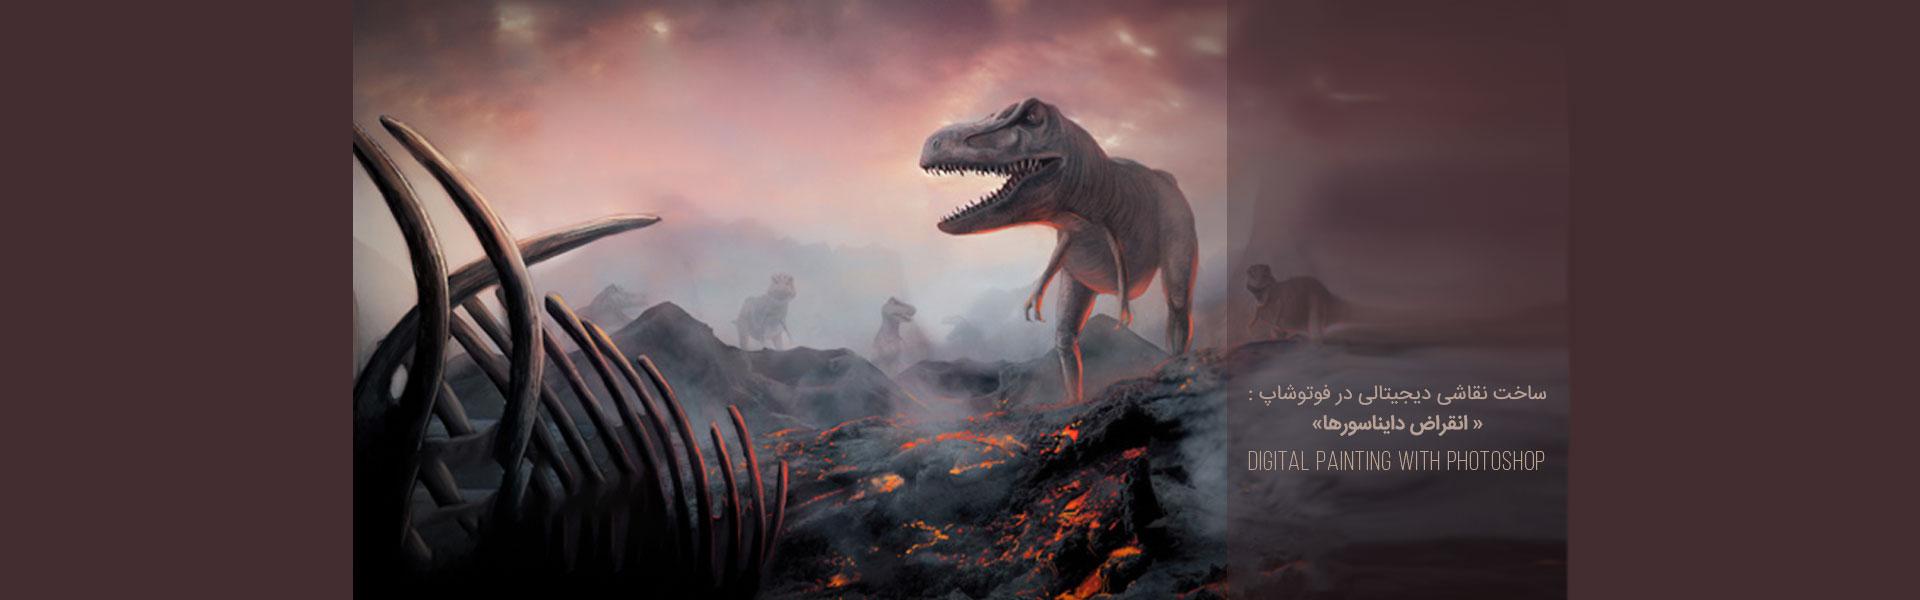 pouyaandish photoshop dainasor2 - ساخت نقاشی دیجیتالی در فوتوشاپ : « انقراض دایناسورها»